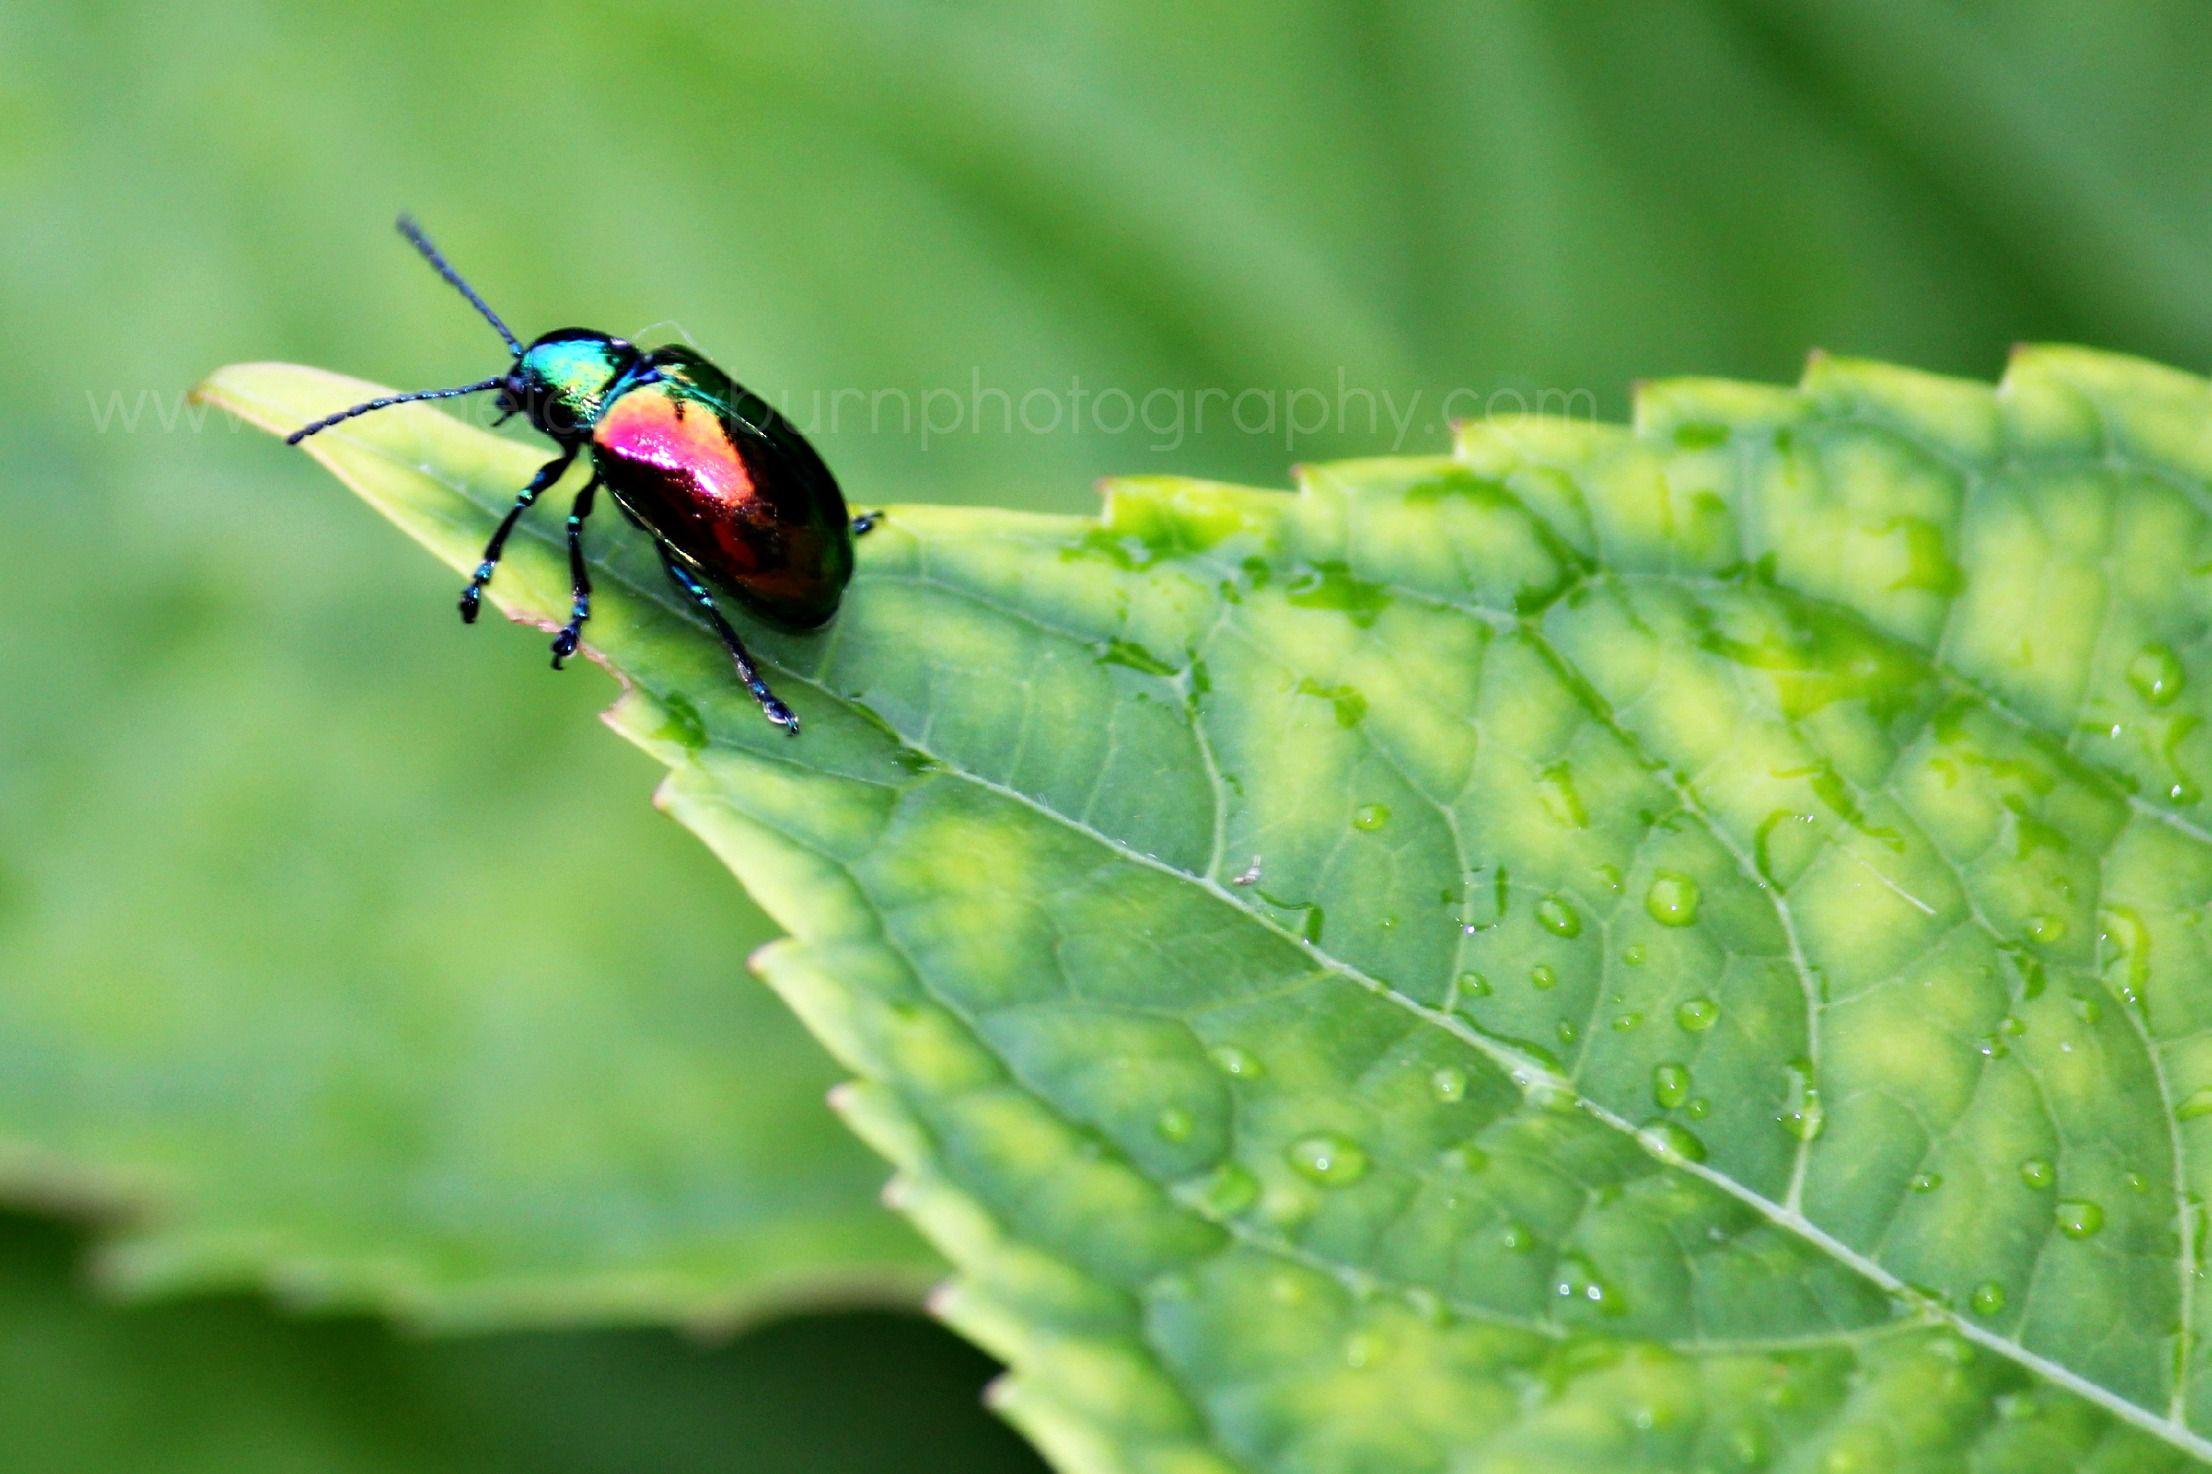 Colorful beetle photo